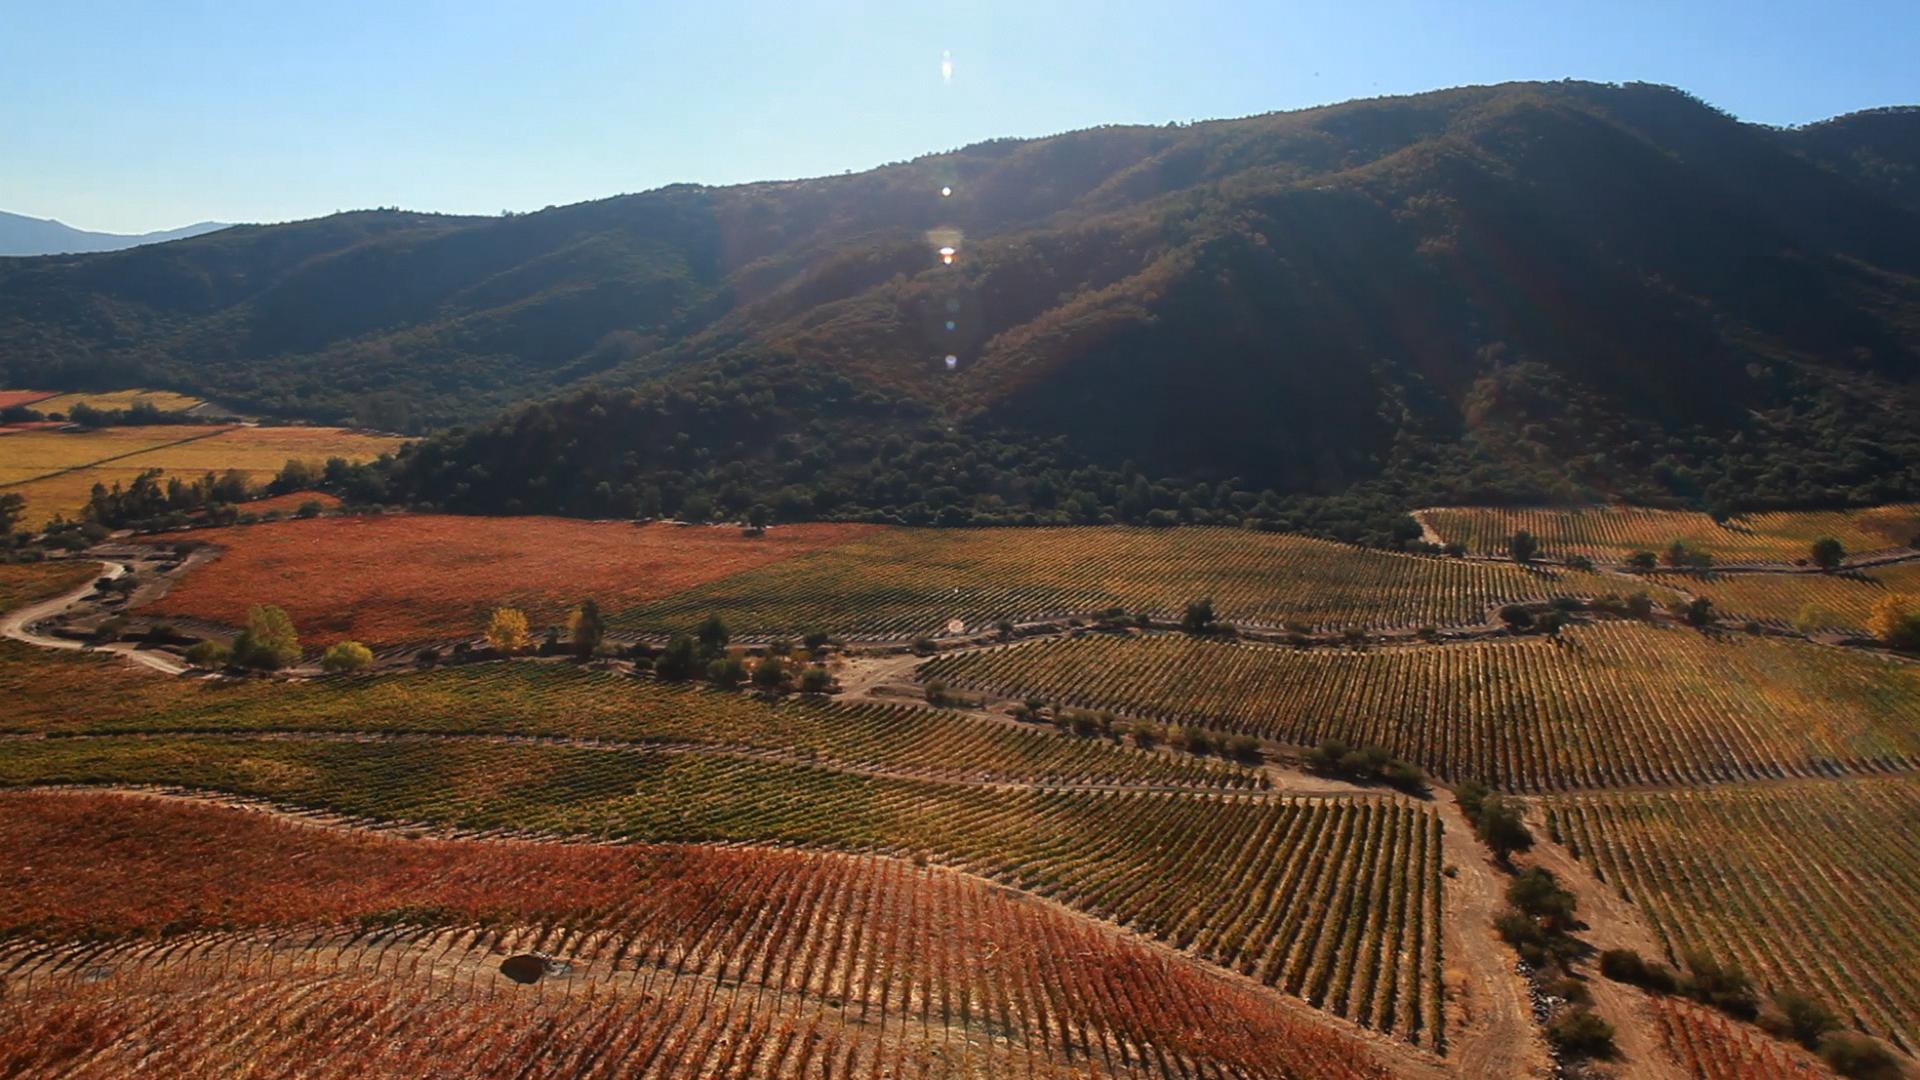 Neyen's dry-farmed vineyards. Apalta Chile.